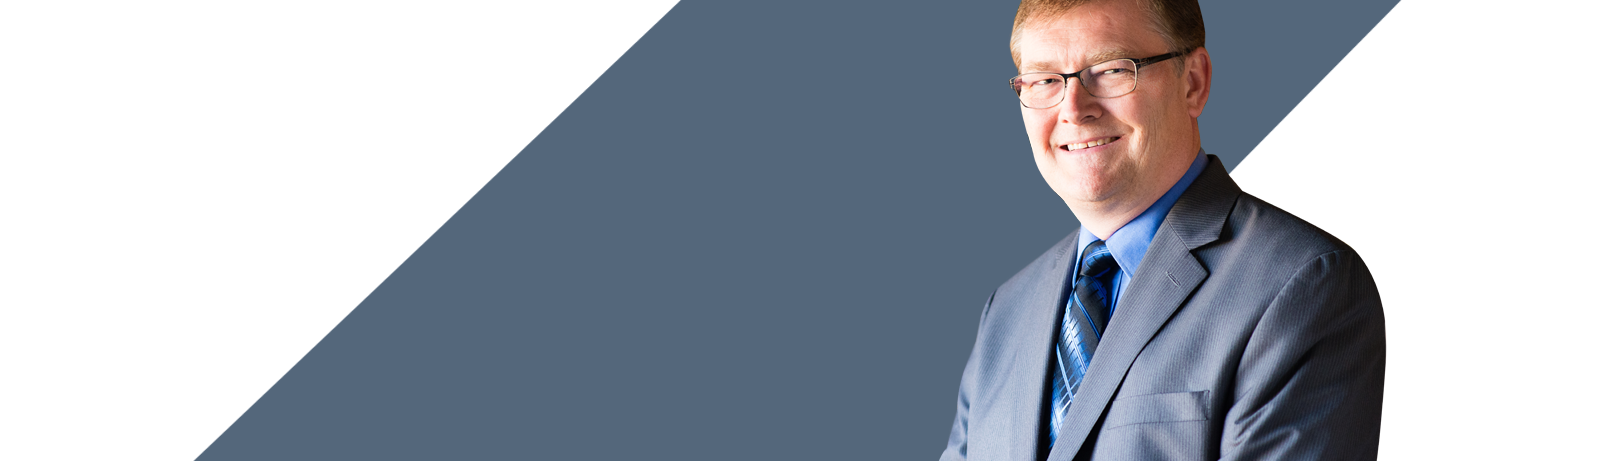 Tacoma Criminal Defense Lawyer - Mark S. Treyz